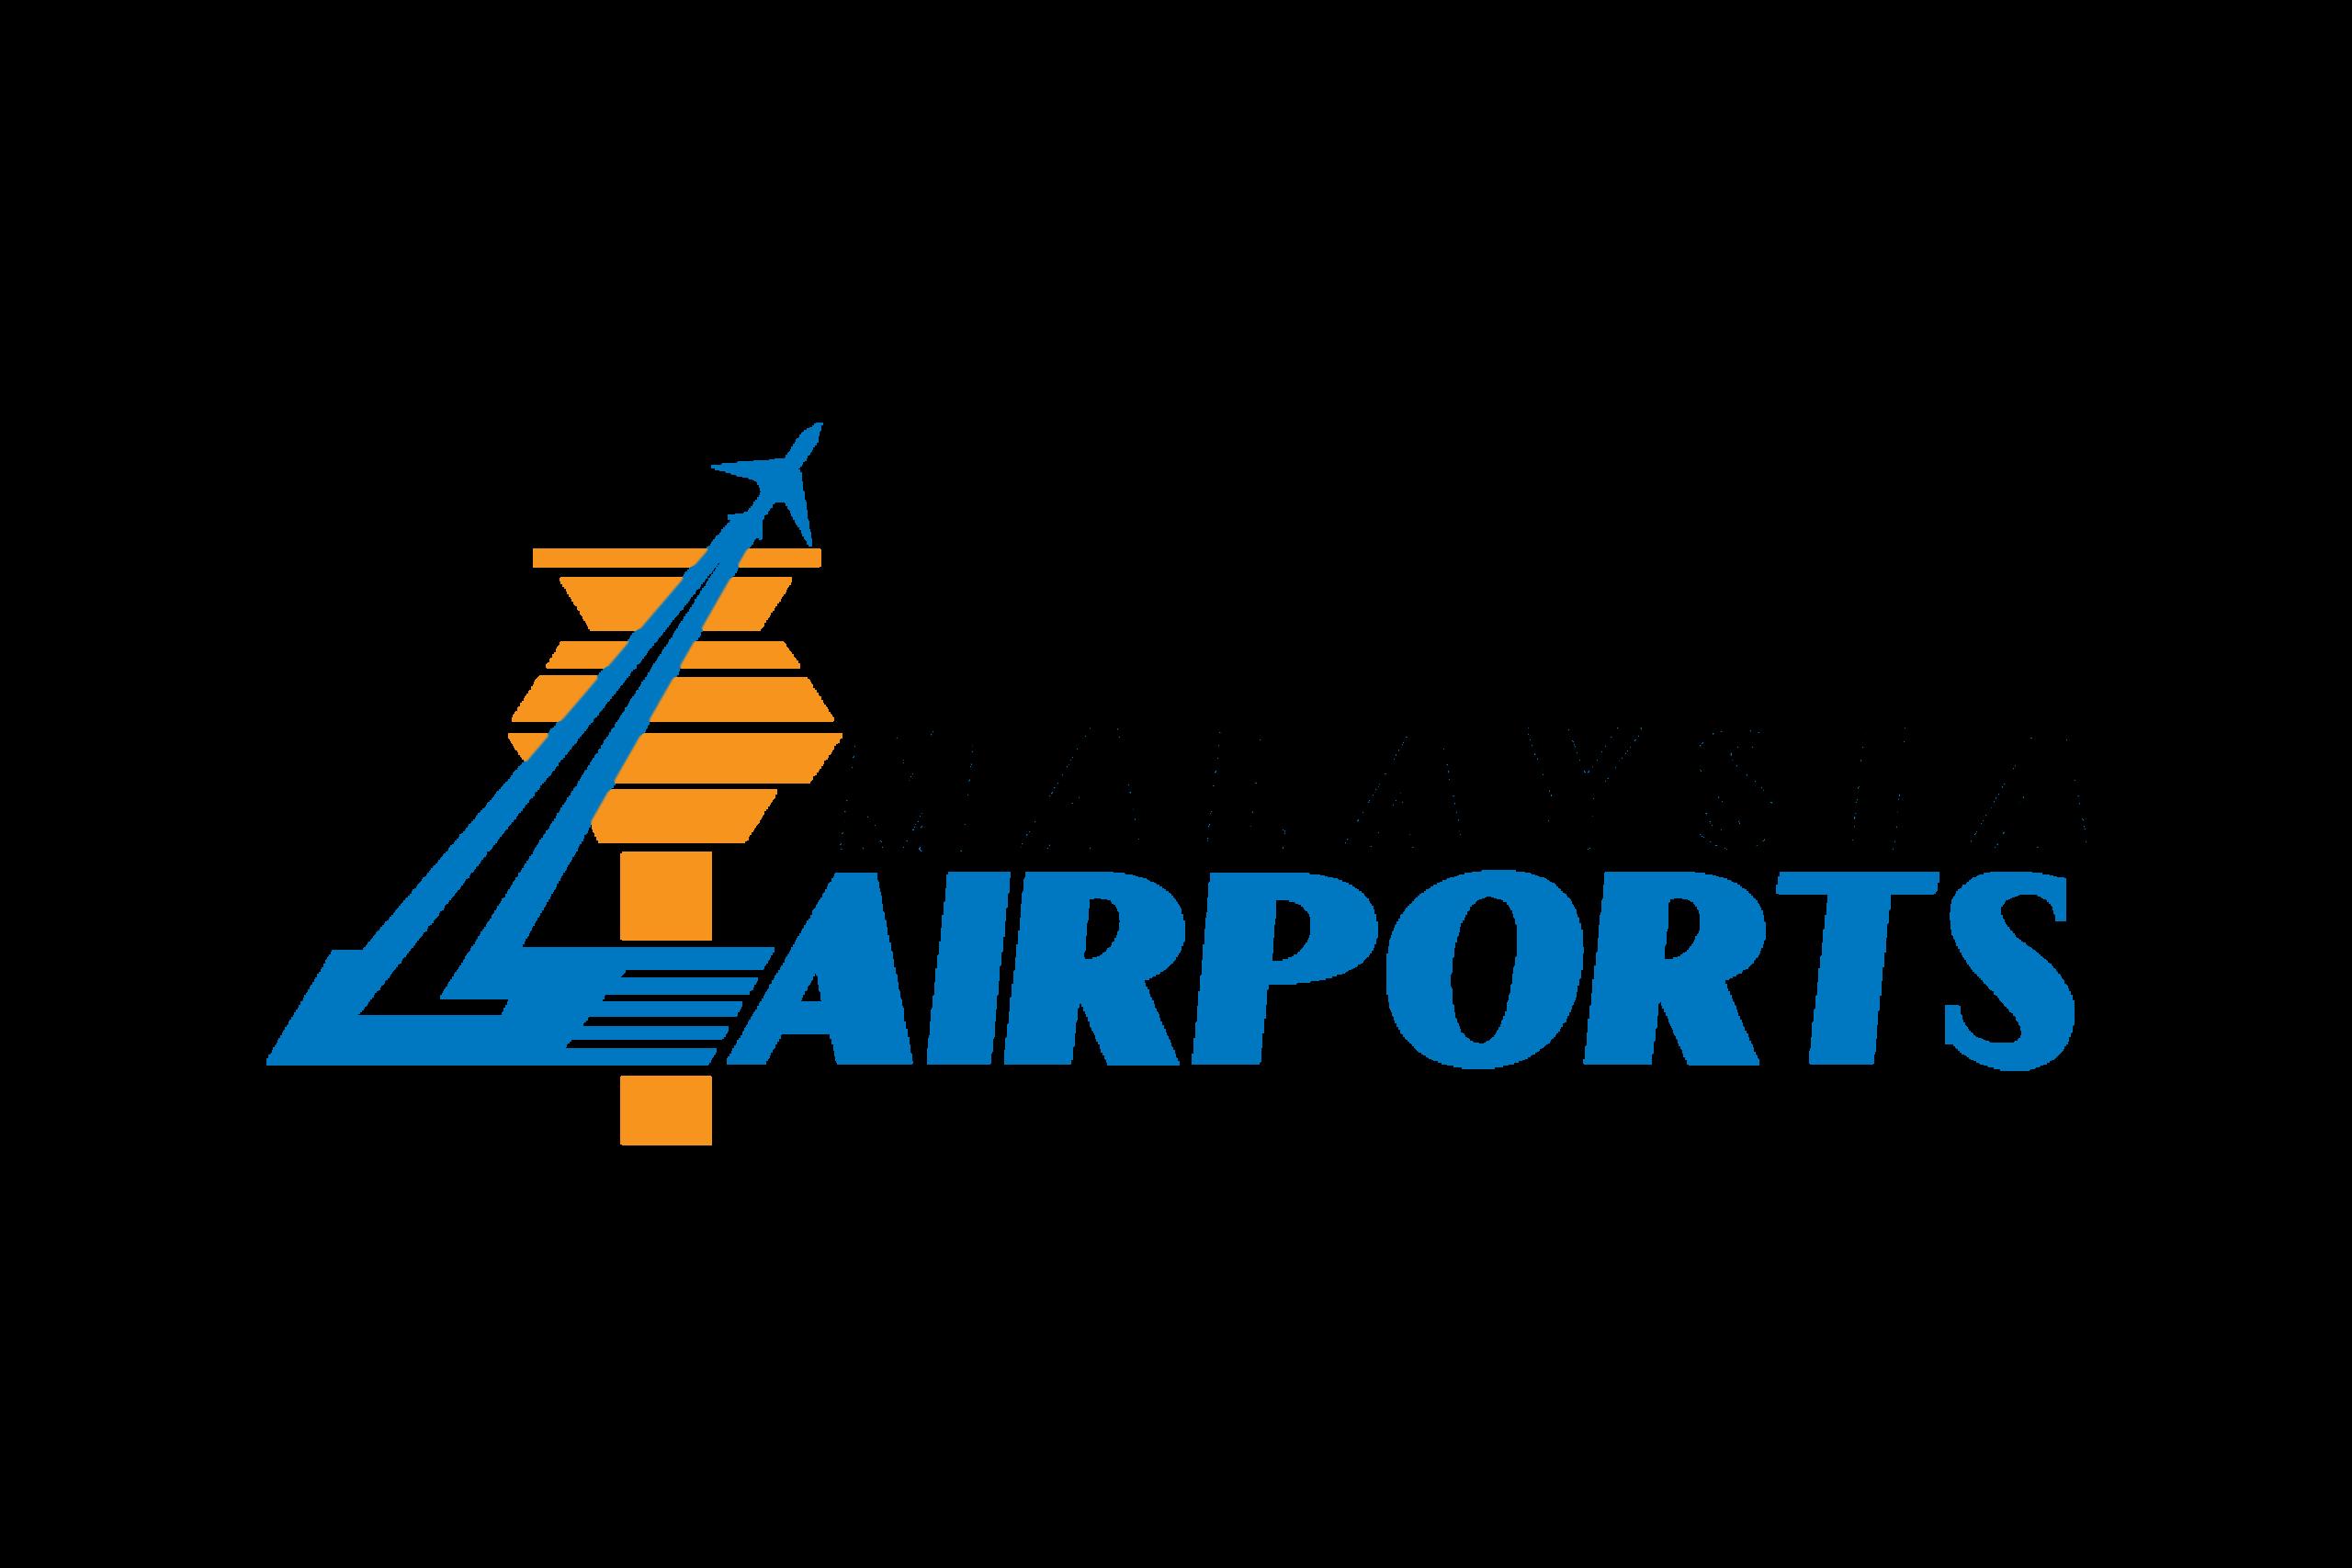 microsoft_excel-logo-7